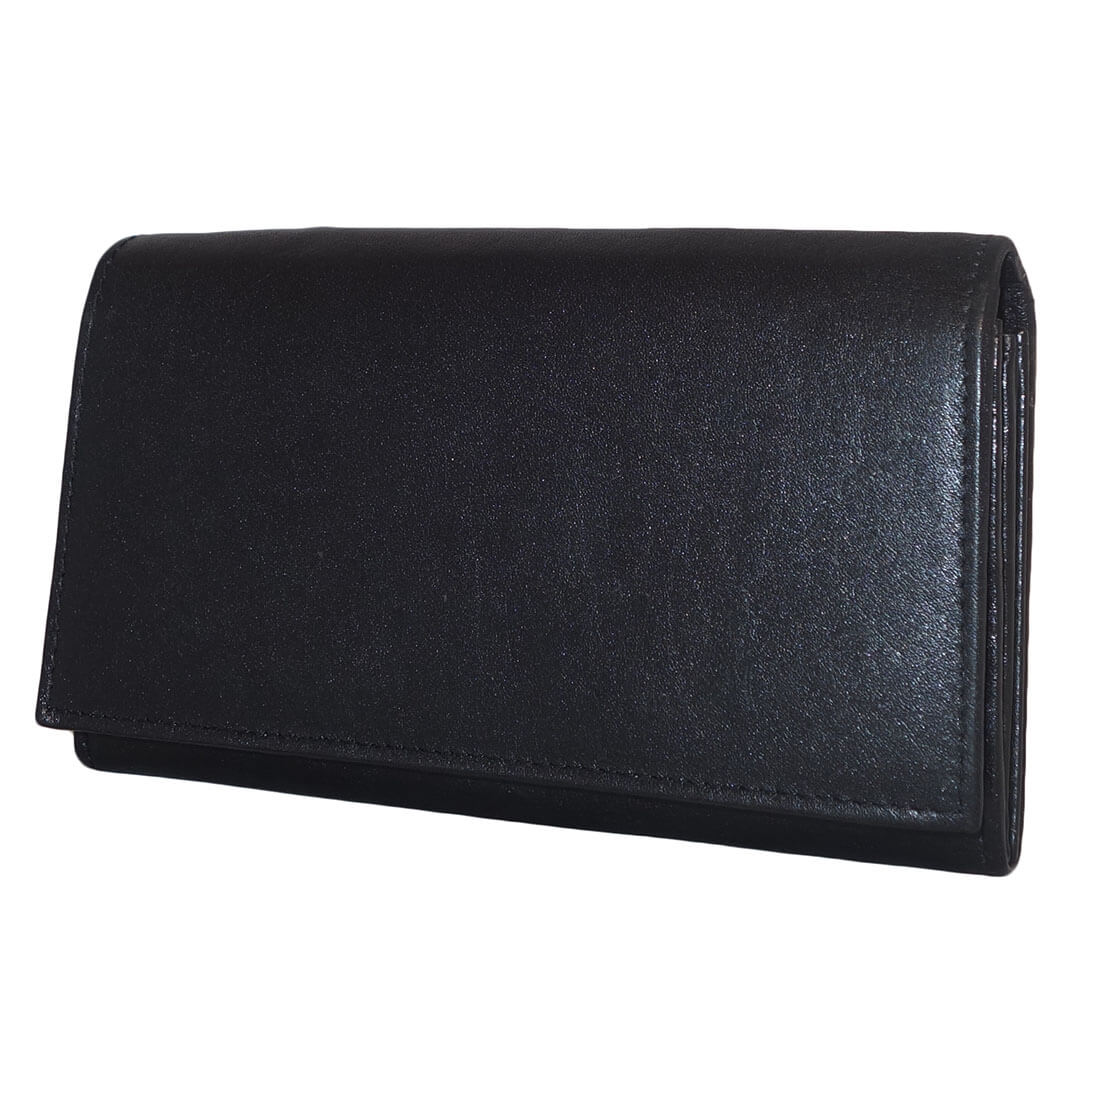 7a2d129006c Leather Design Dames Overslag Portemonnee met Beugel Zwart